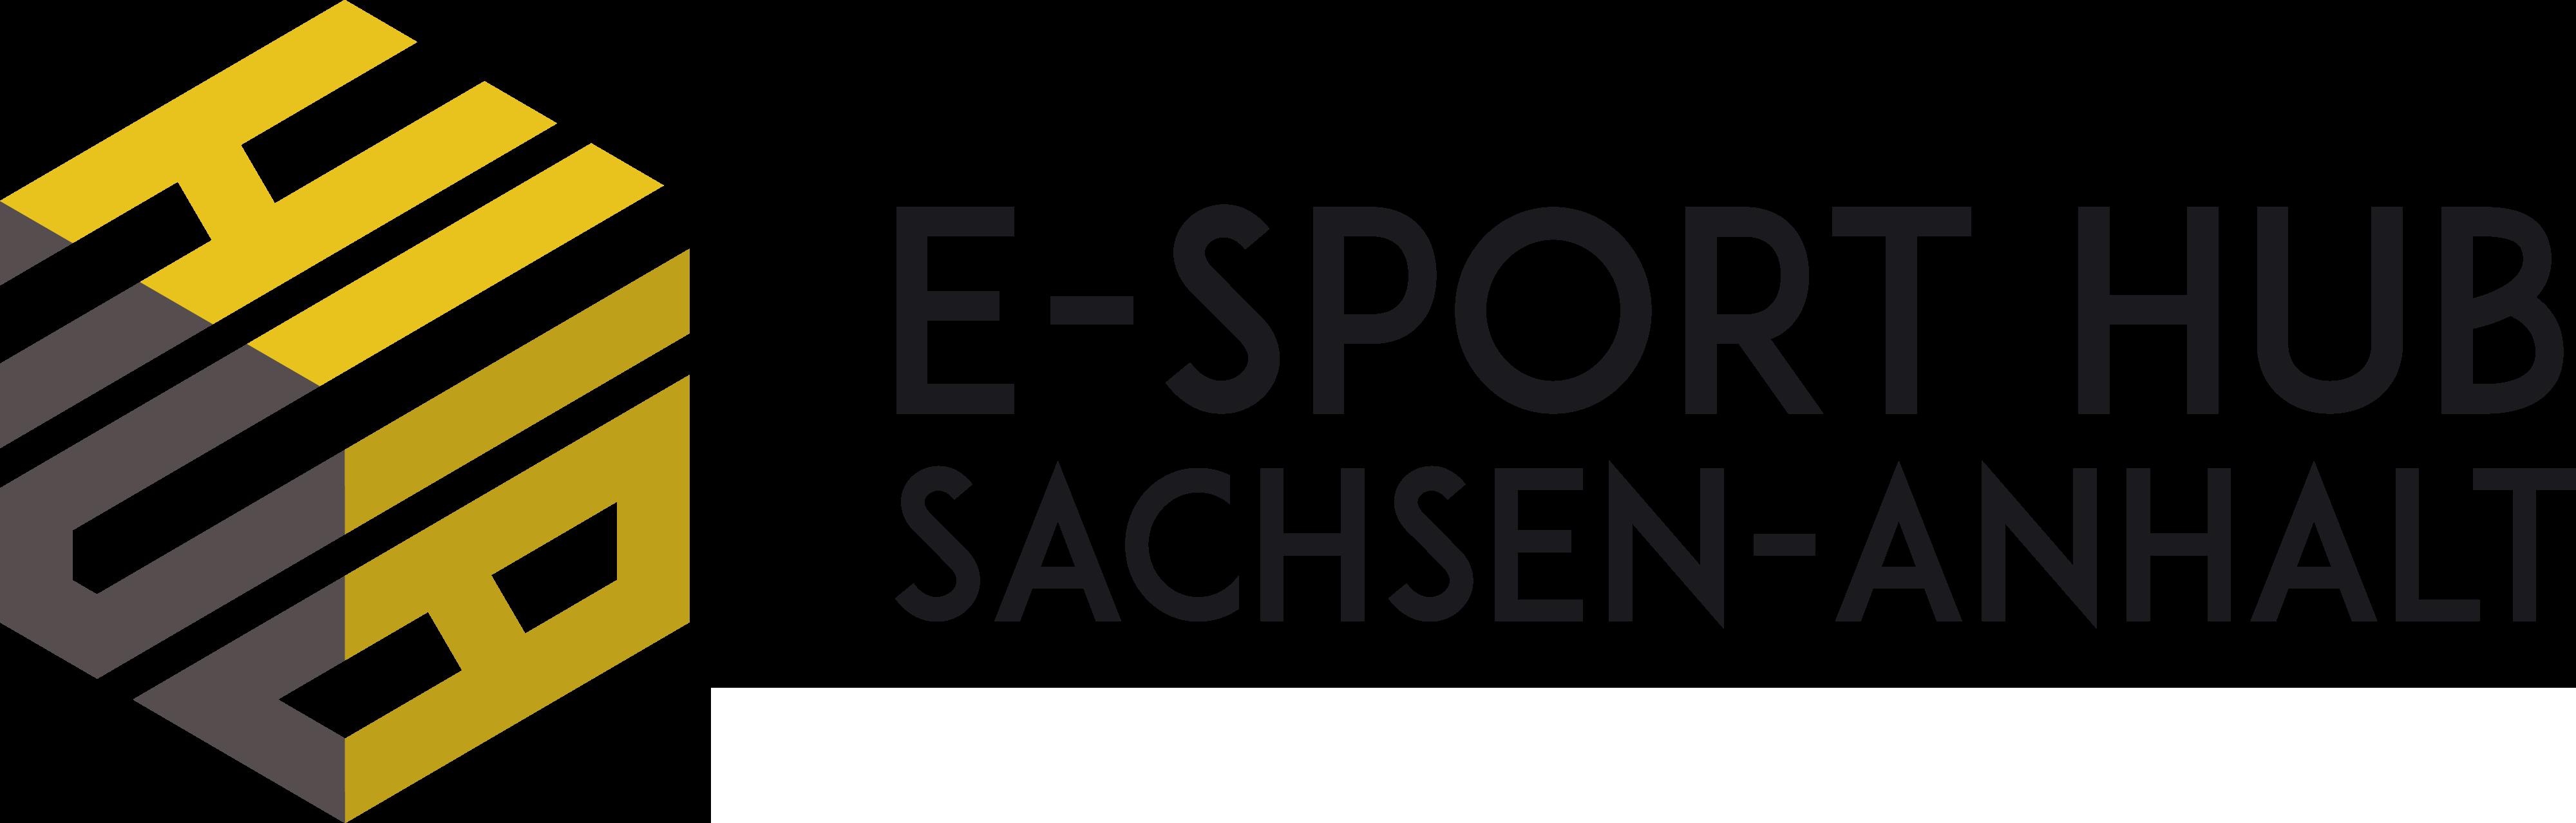 E-Sport Hub Sachsen-Anhalt